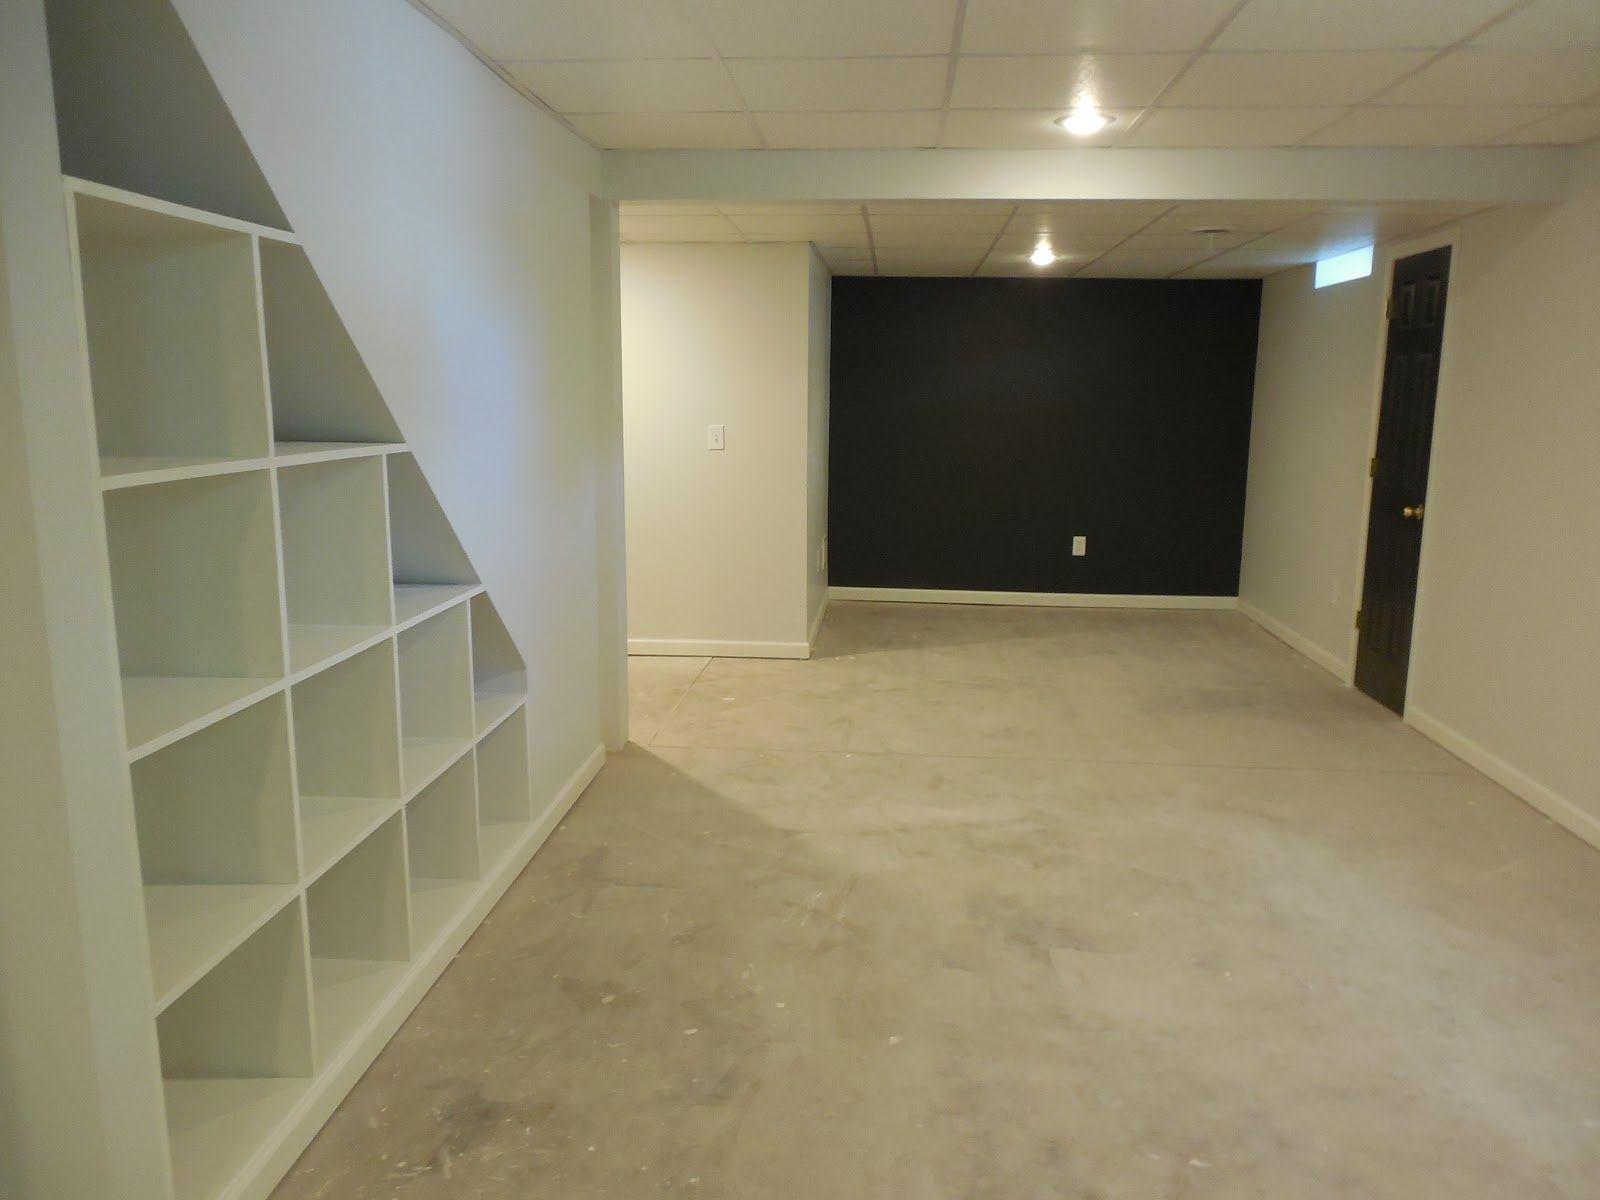 Finished basement storage underneath stairs home basementgarage